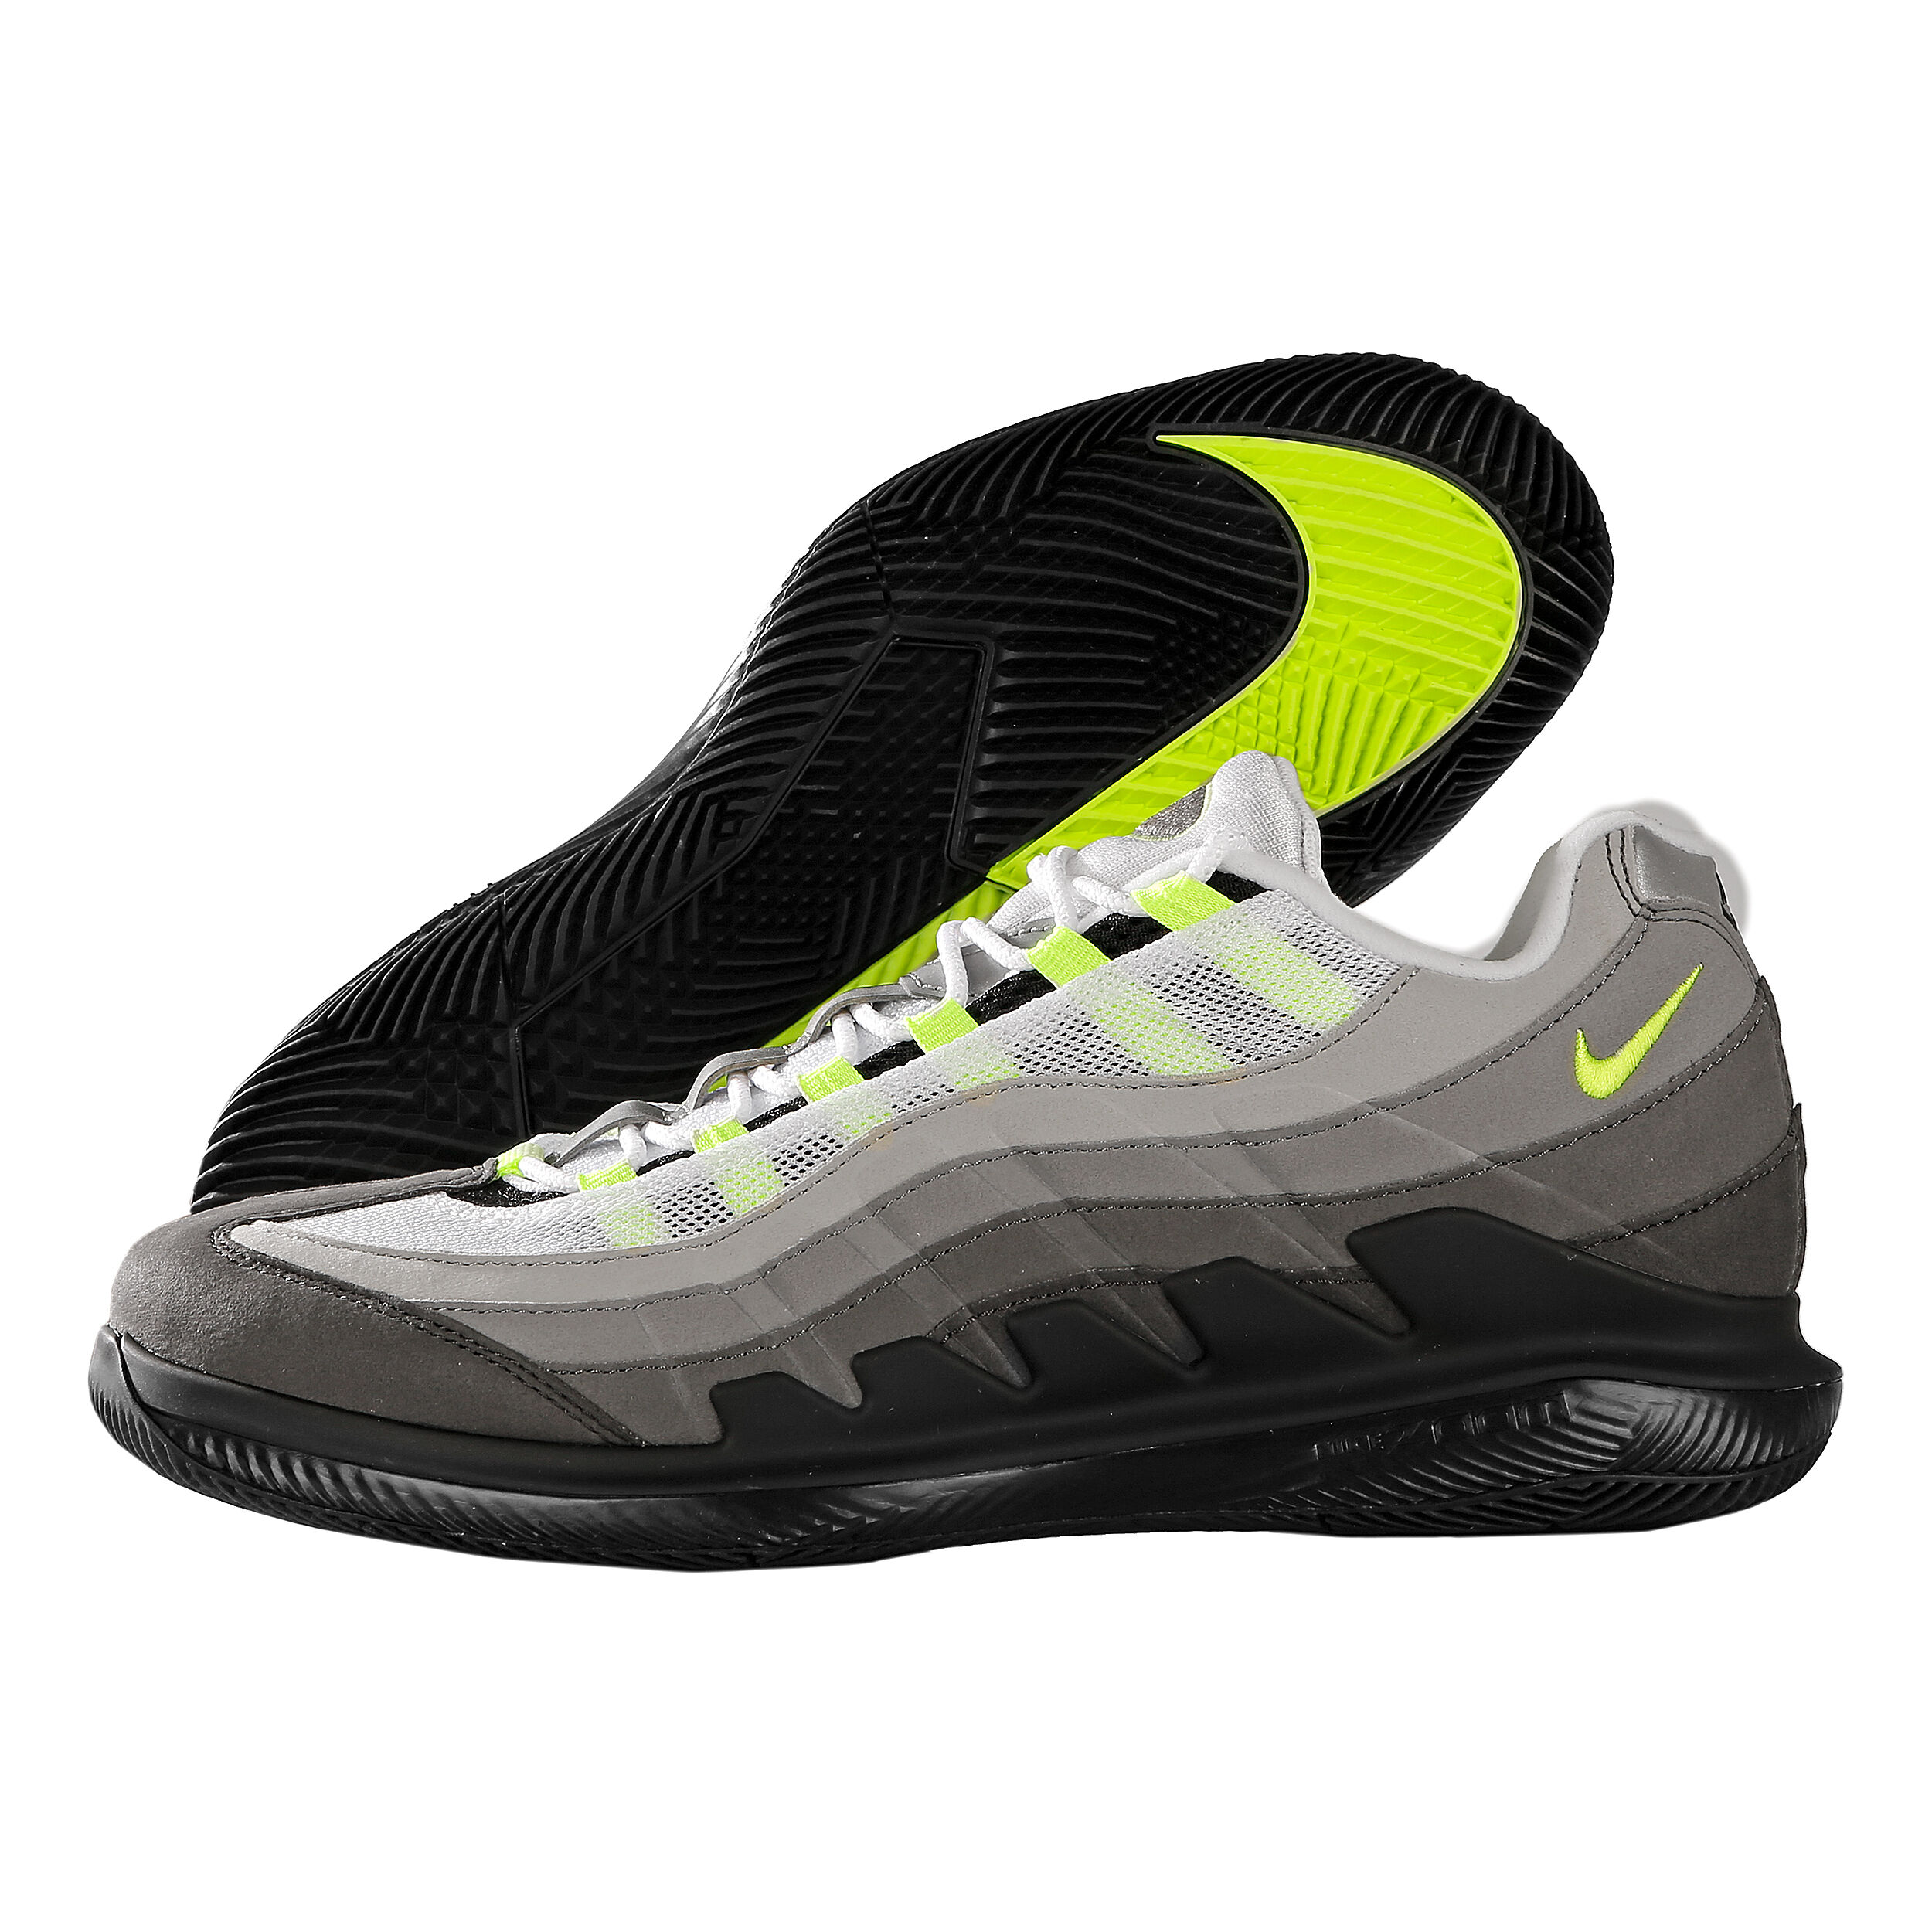 Nike Roger Federer Vapor X Air Max 95 Neon Allcourtschuh